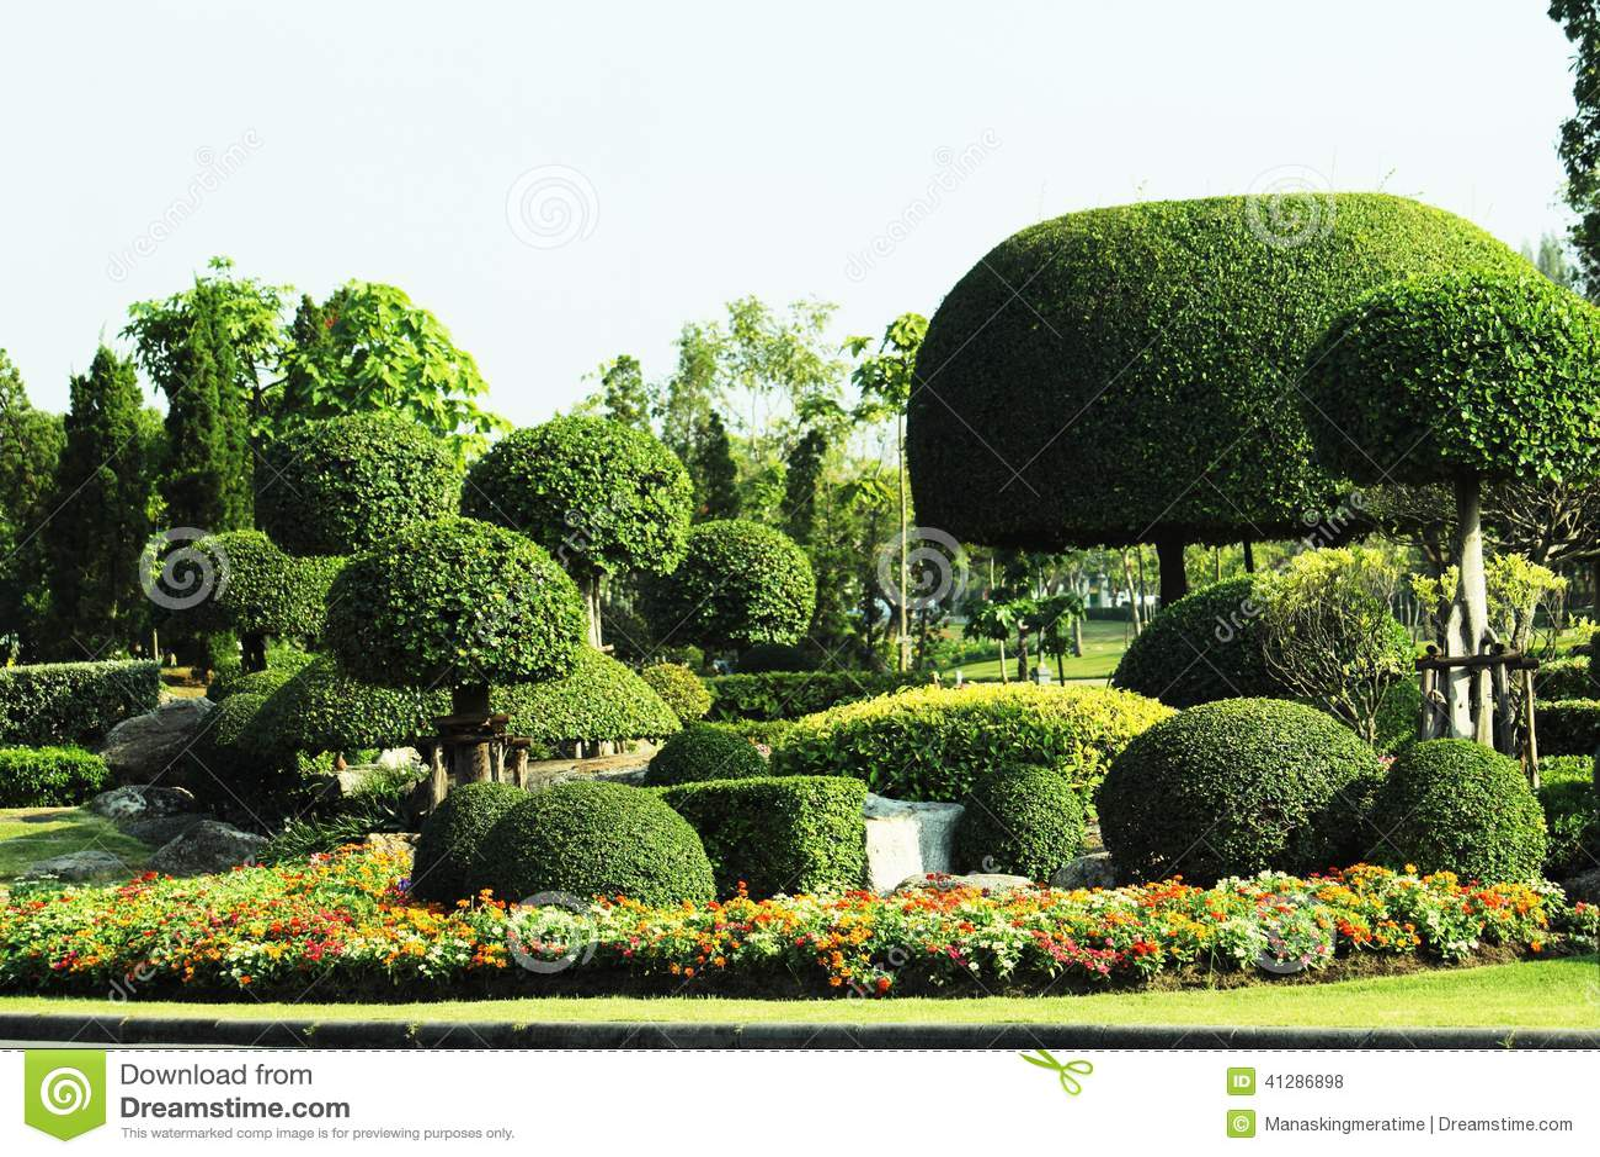 Japanese Style Garden In Suan Louhng Rama 9 Bangkapi District Thailand